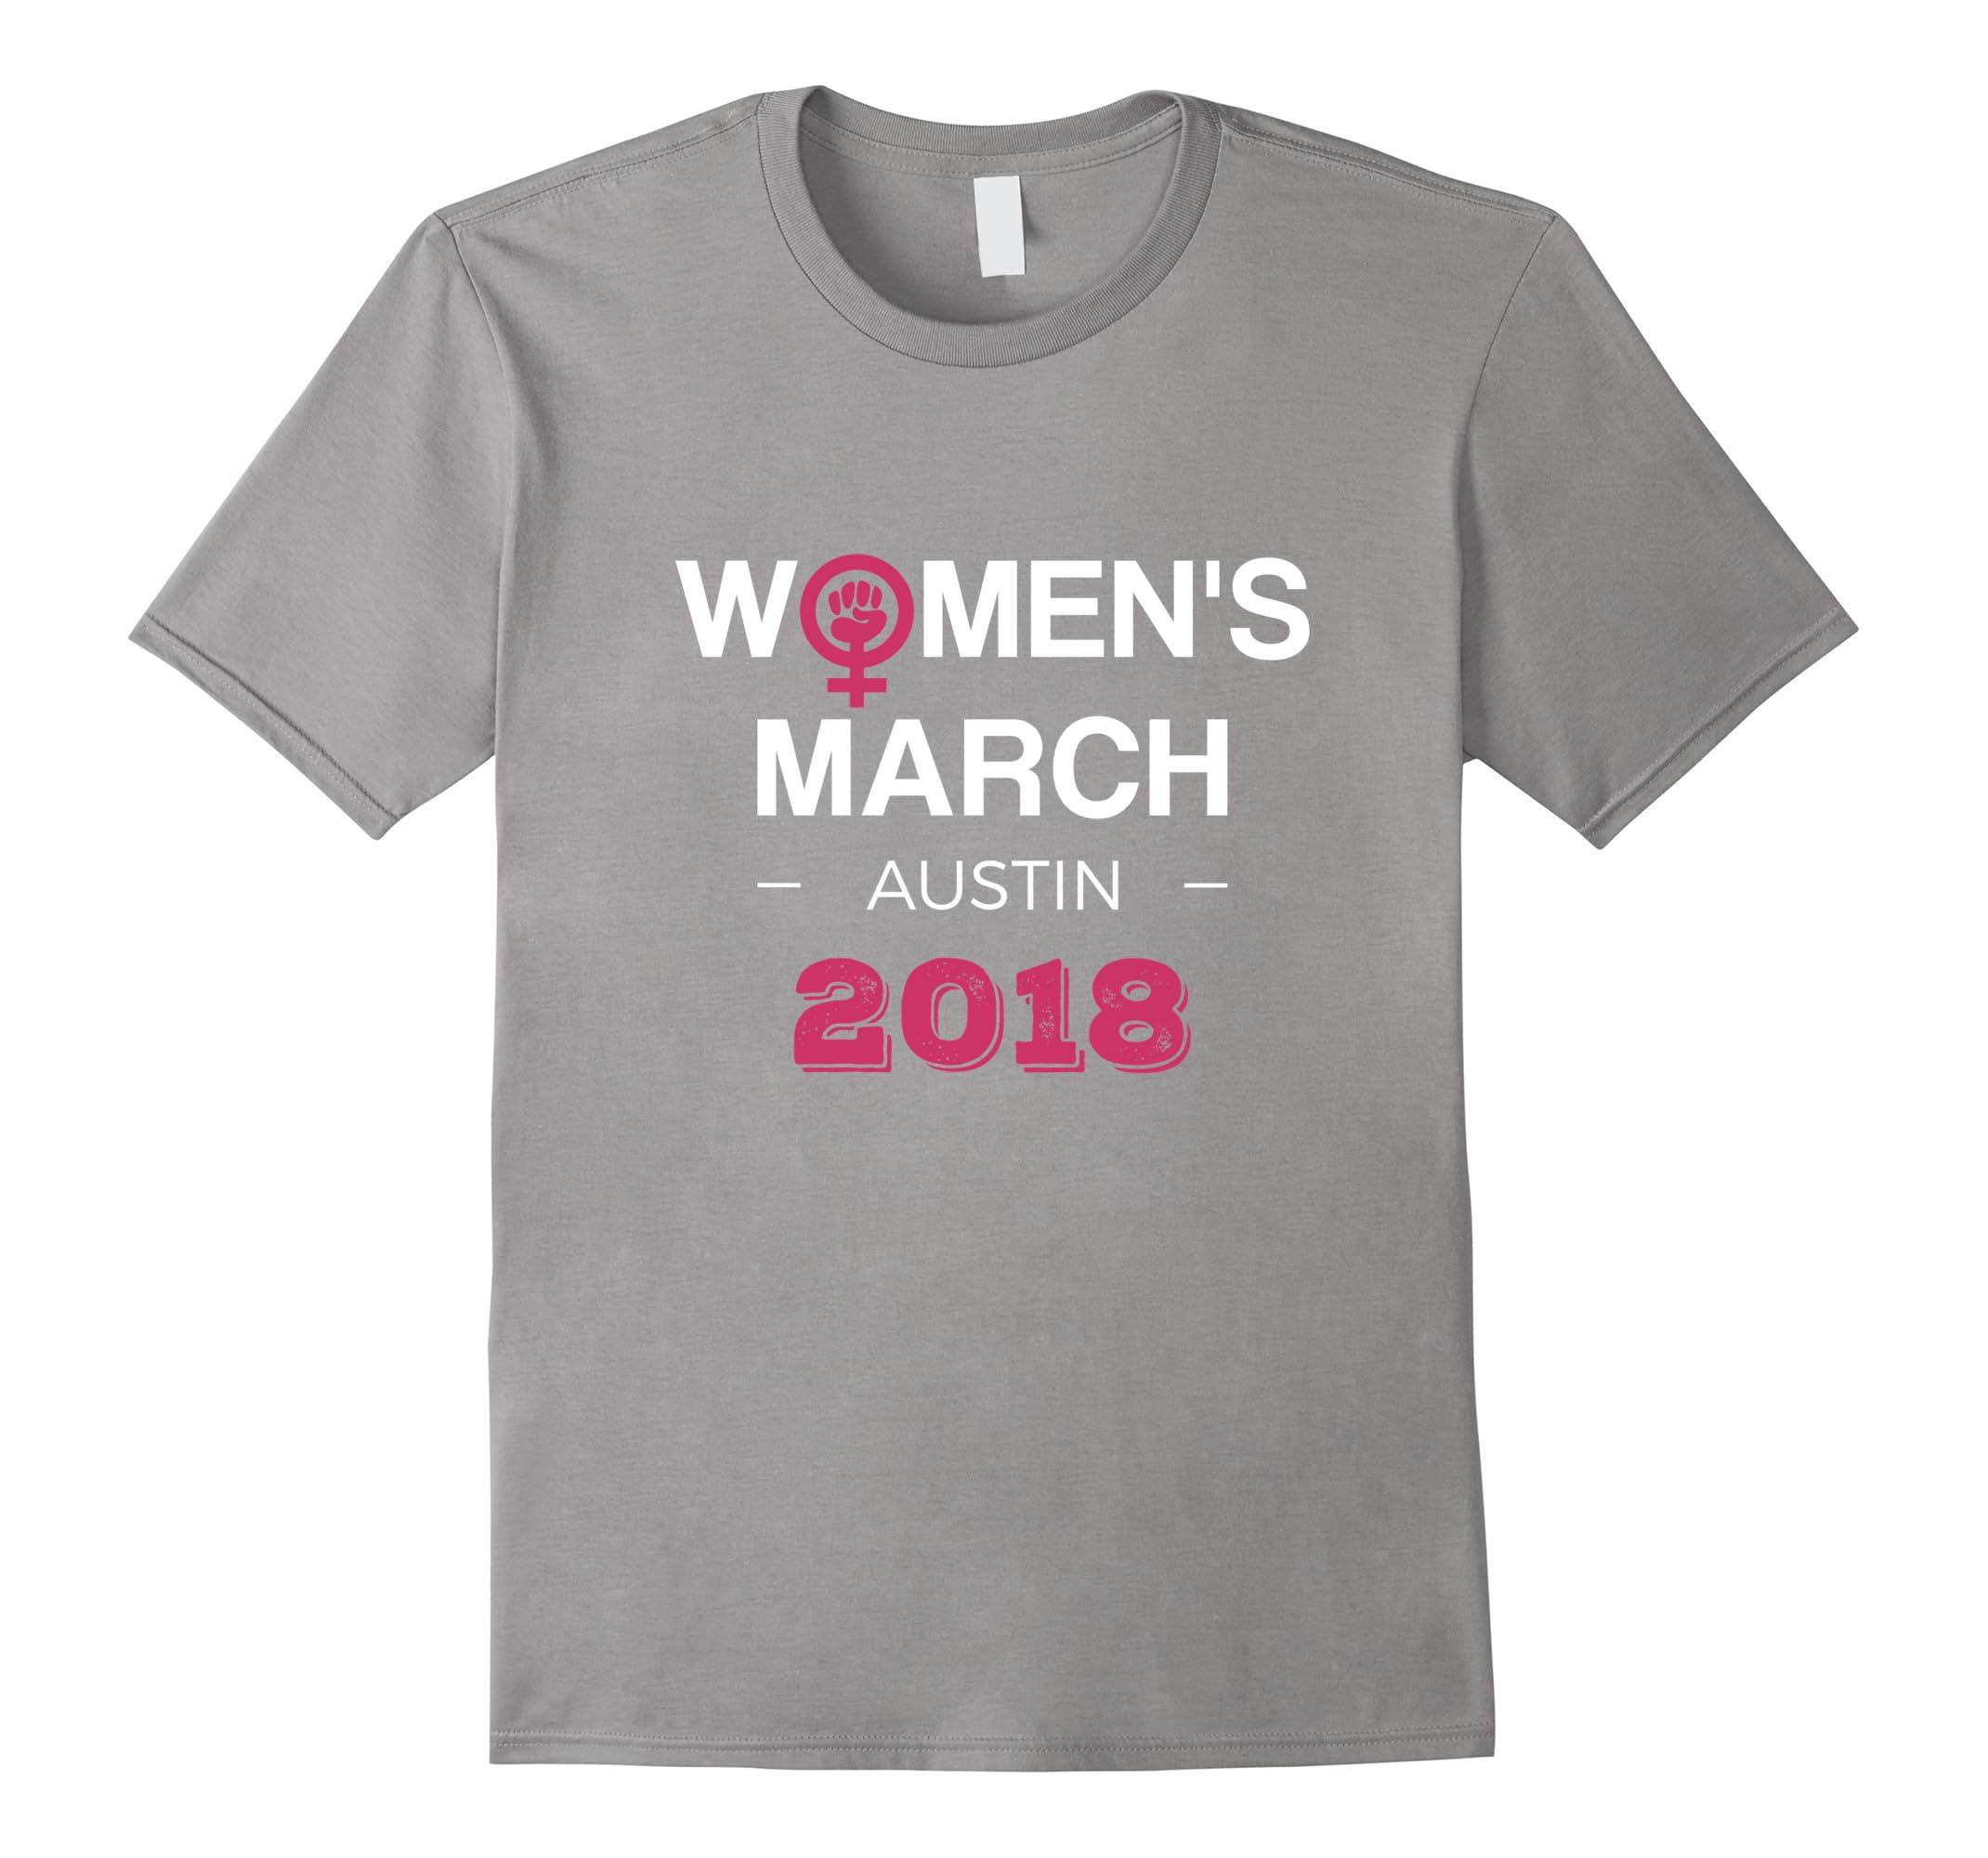 Austin Womens March 2018 T Shirt Feminism Symbol Design Ah My Shirt